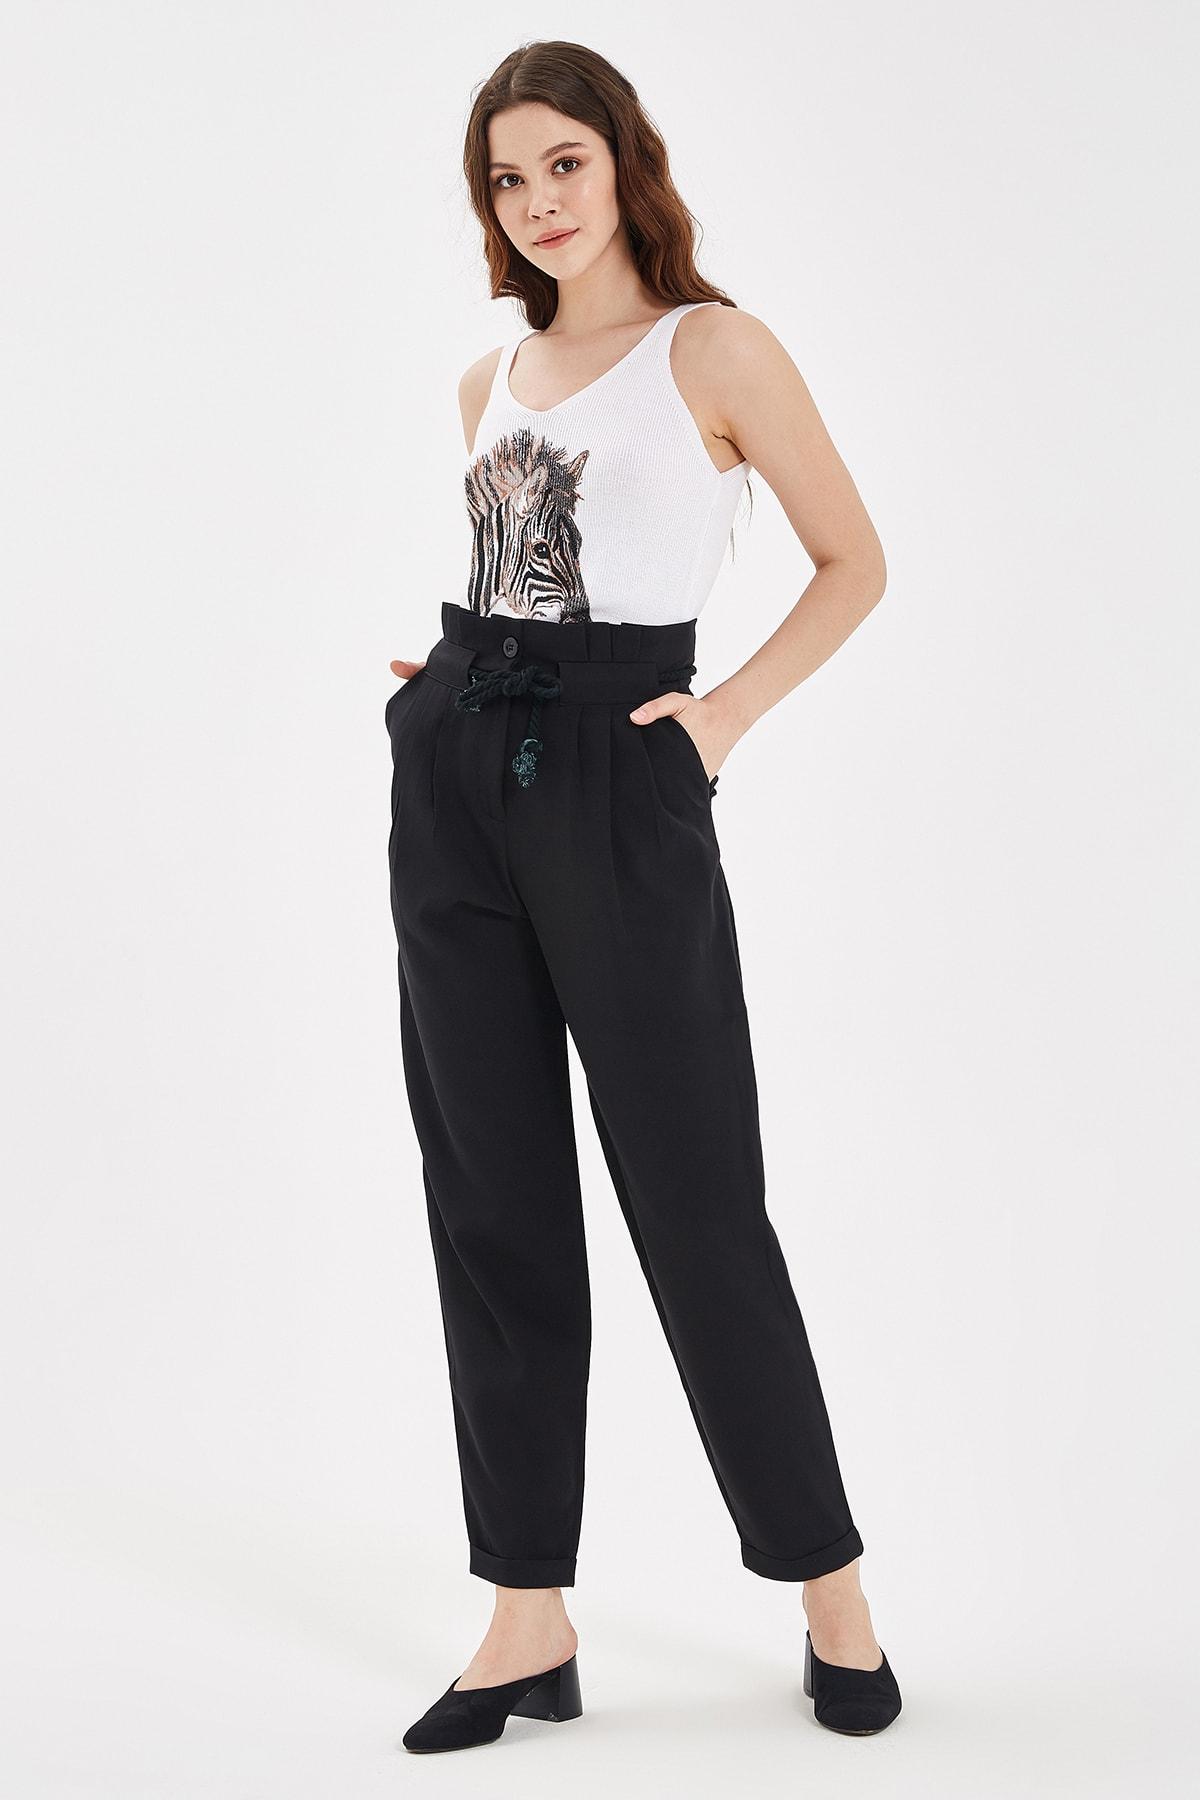 Nisan Triko Siyah Bağlama Detaylı Pantolon 1